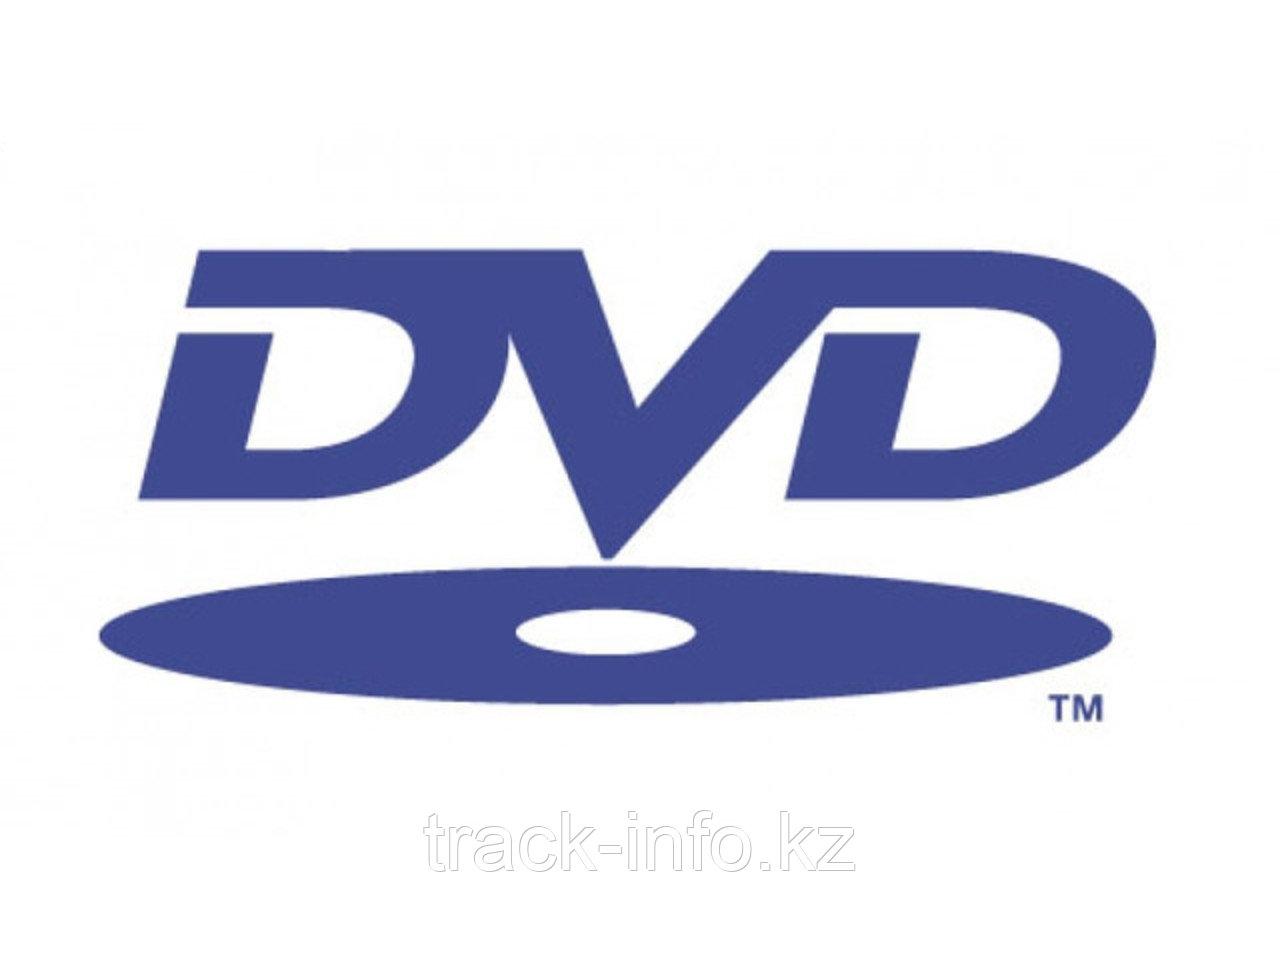 Диски DVD+R Zonhuang 4.7gb 16x bulk (50) new